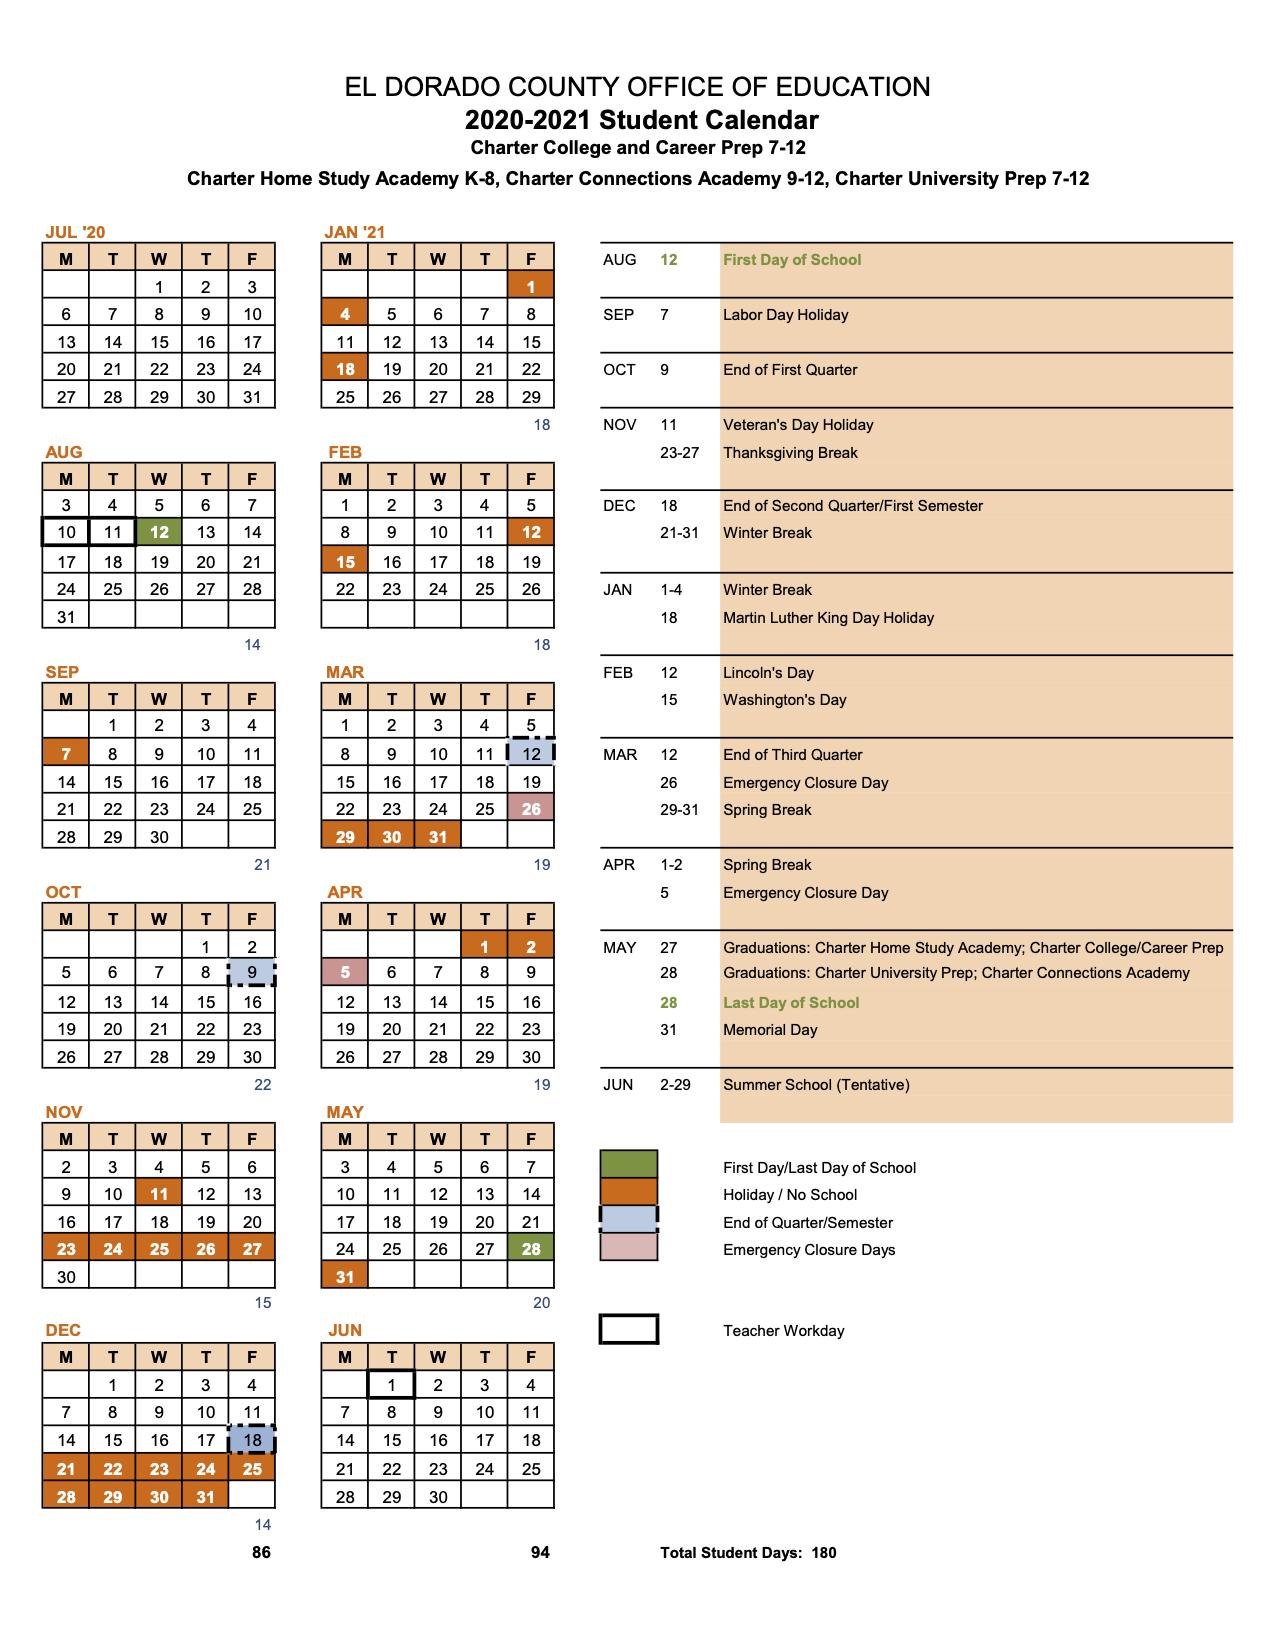 20-21 Student Calendar